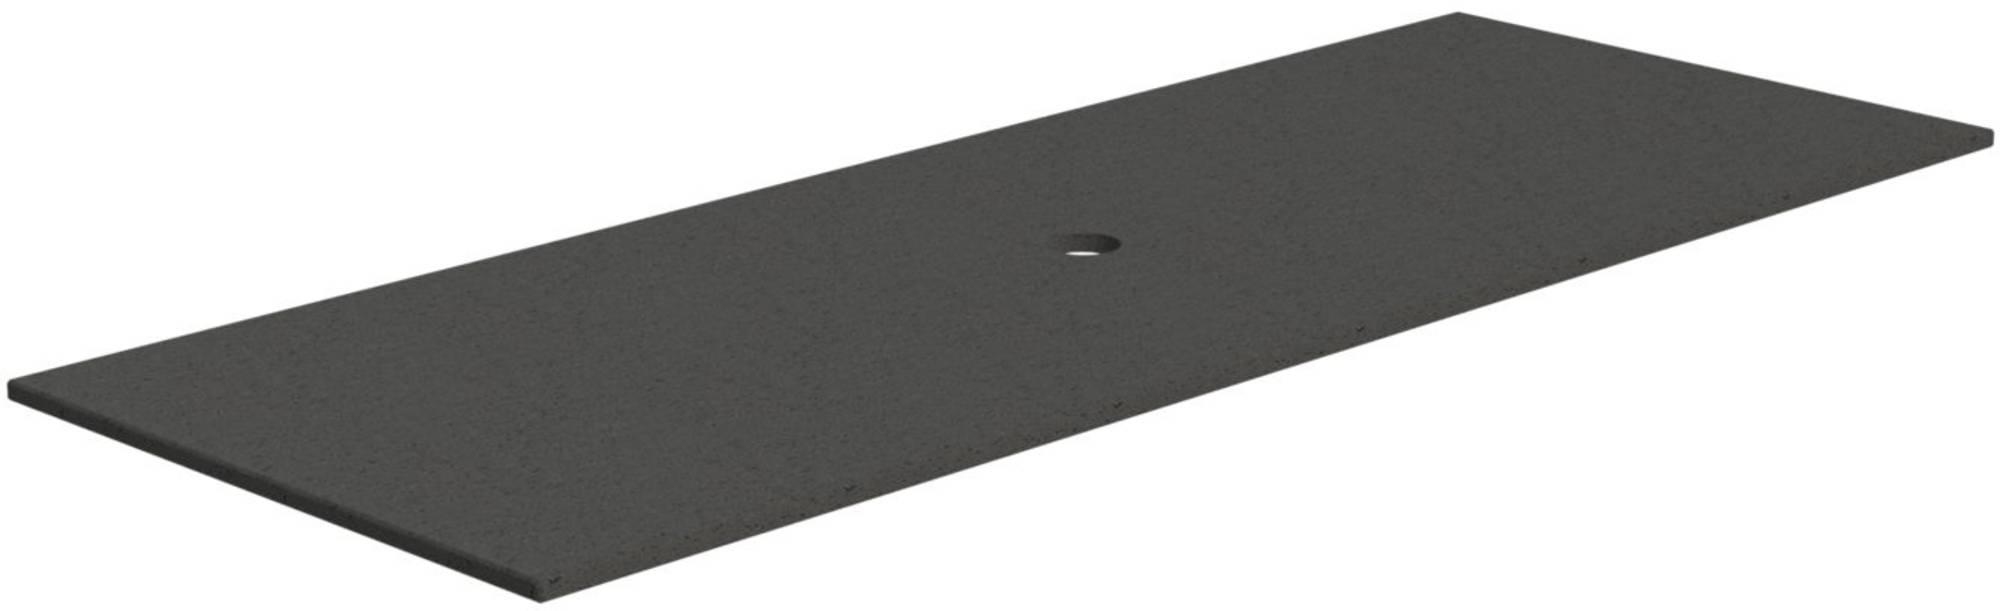 Thebalux Stone 2 Afdekblad Composiet 130x48,5x2 cm Taupe Grain